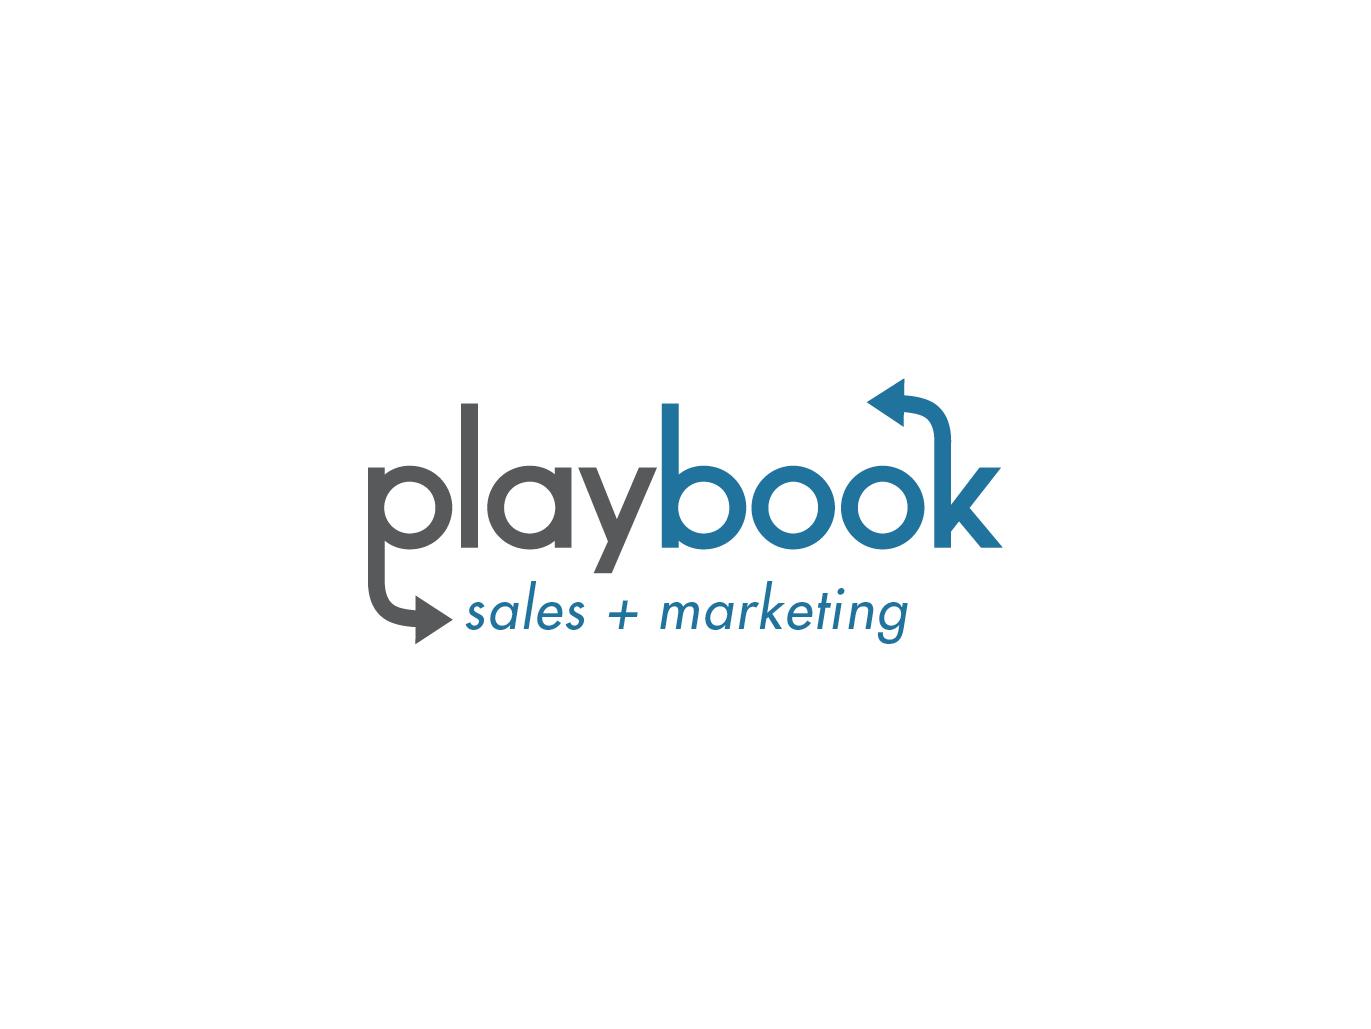 PlaybookLogo